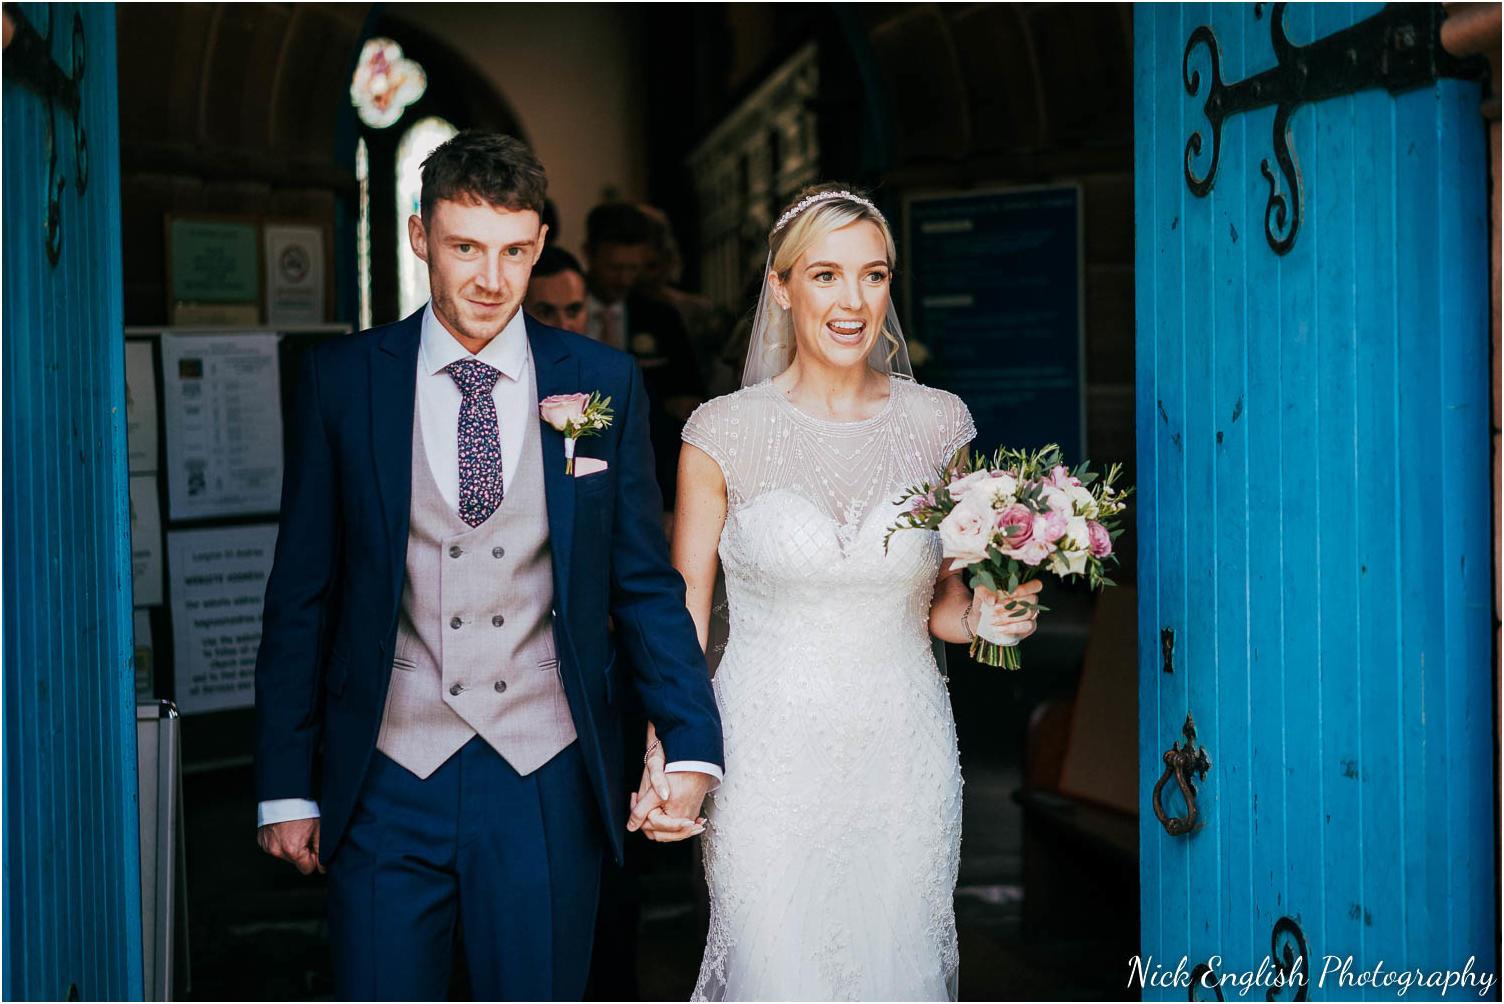 Mitton_Hall_Wedding_Photograph-46.jpg